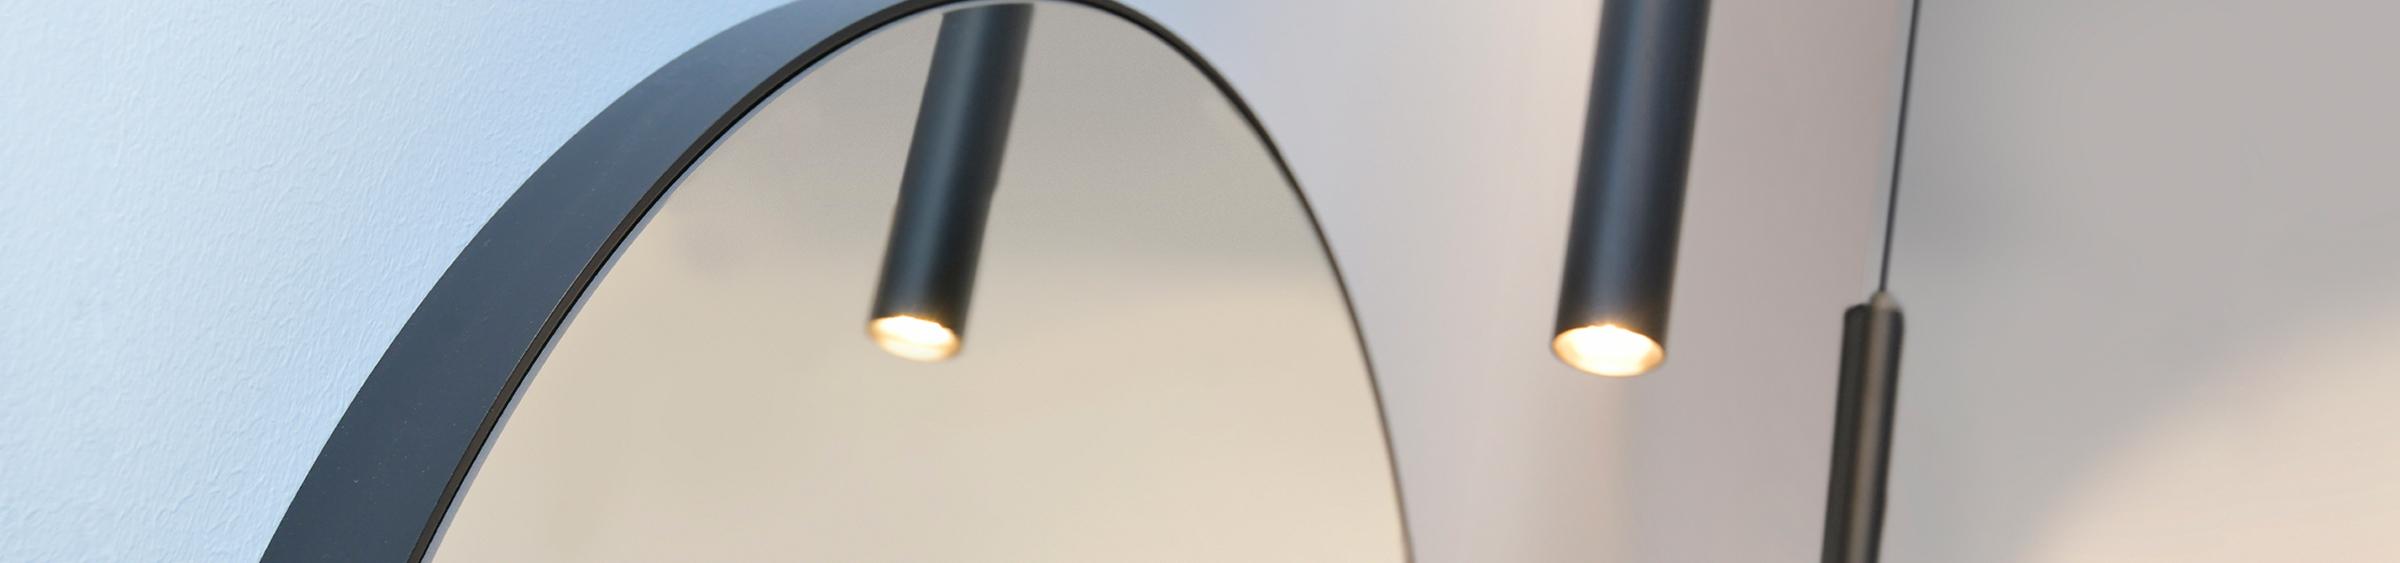 Looox Light Collection - Looox Light Collection